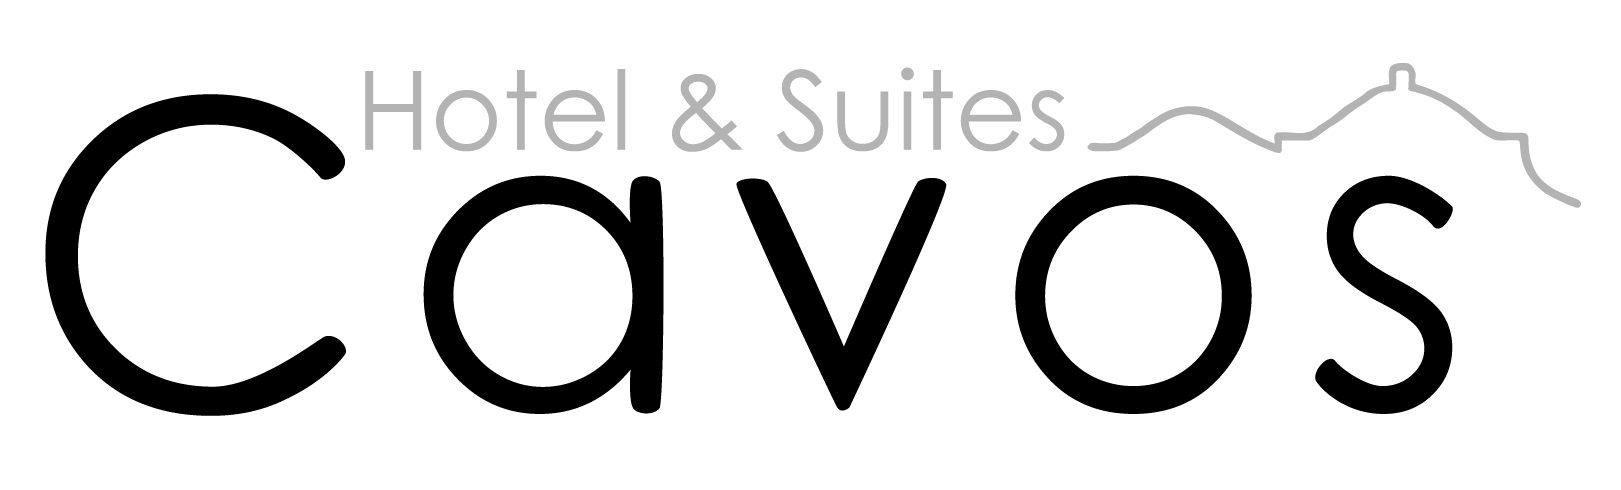 Cavos Hotel & Suites | Studios - Cavos Hotel & Suites